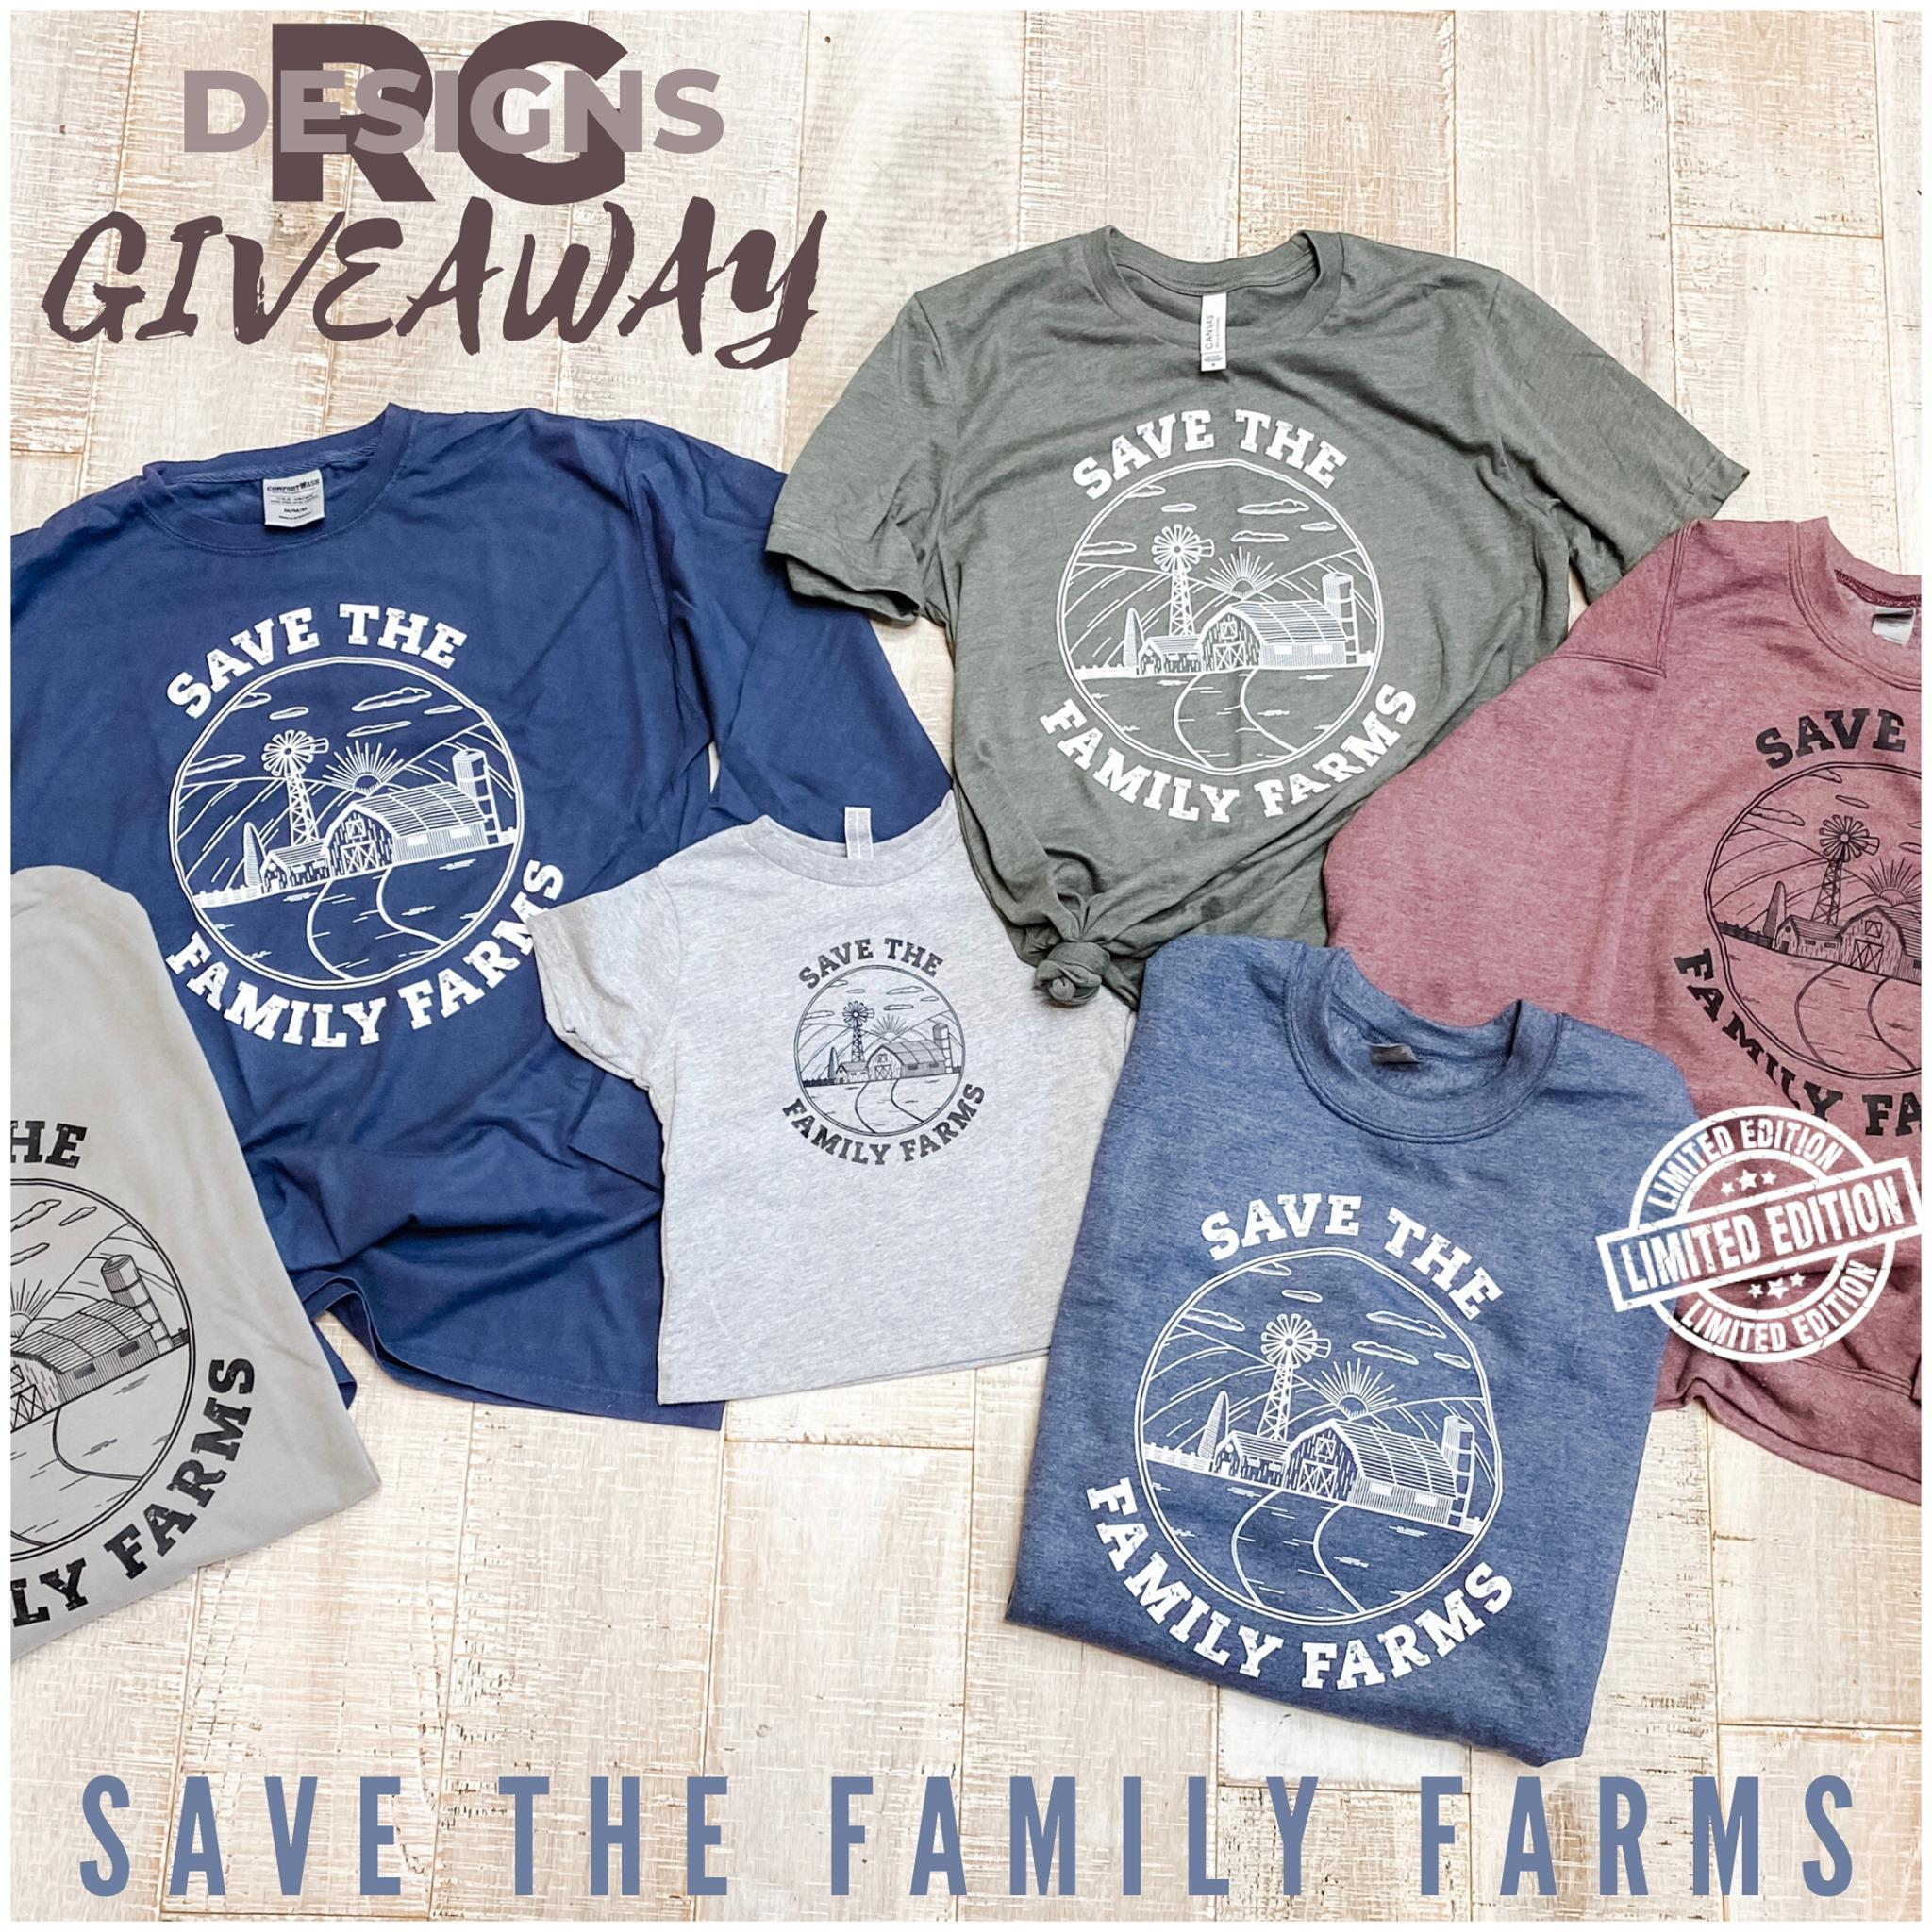 Save the family farms shirt